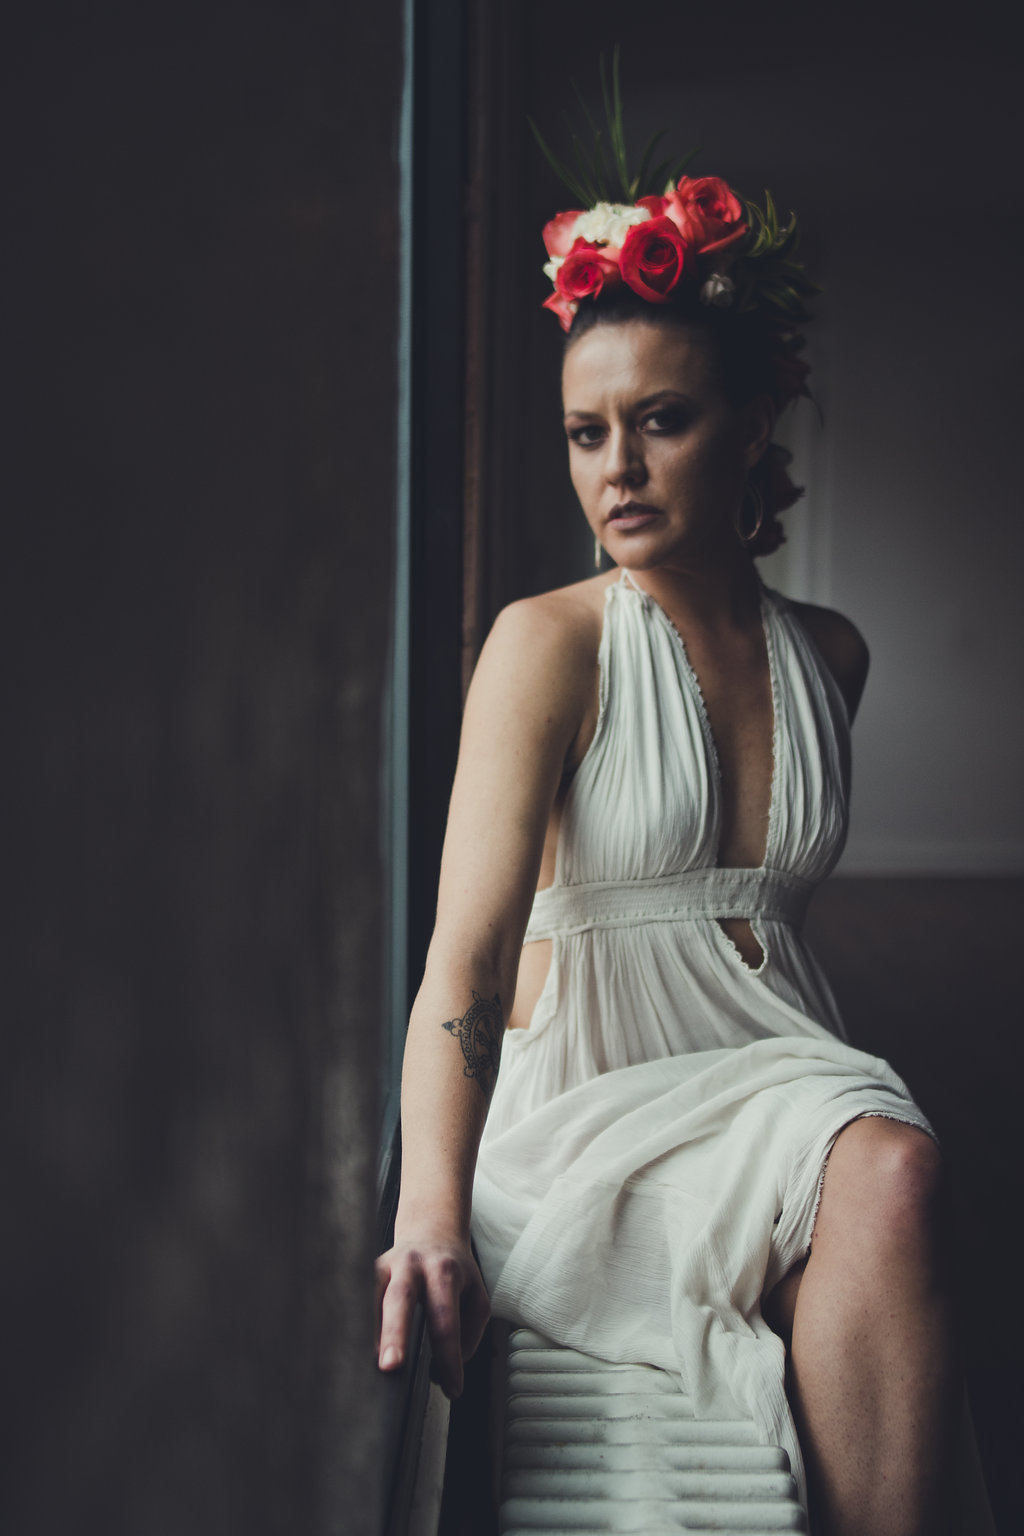 Lisa Rundall Wedding Photography Colorado model sitting on wall heater